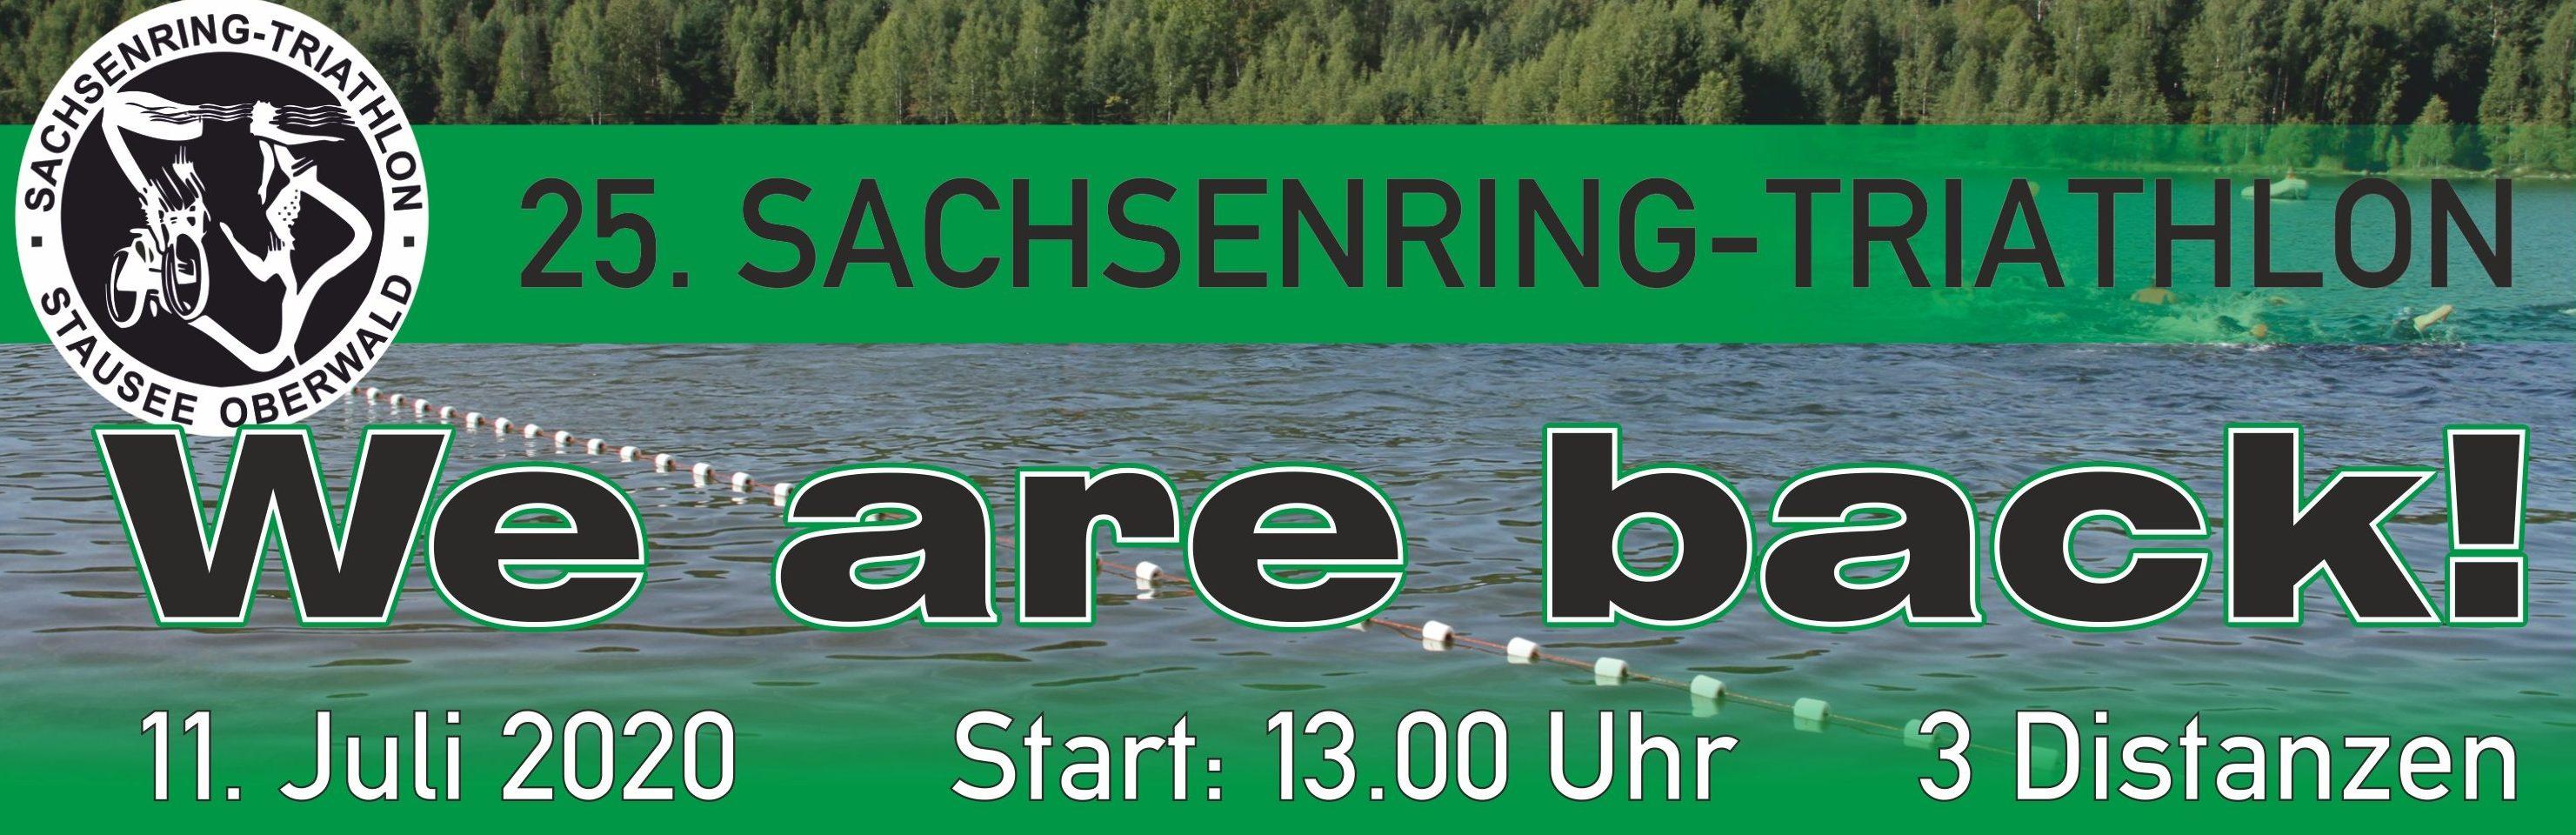 Sachsenring-Triathlon 2020